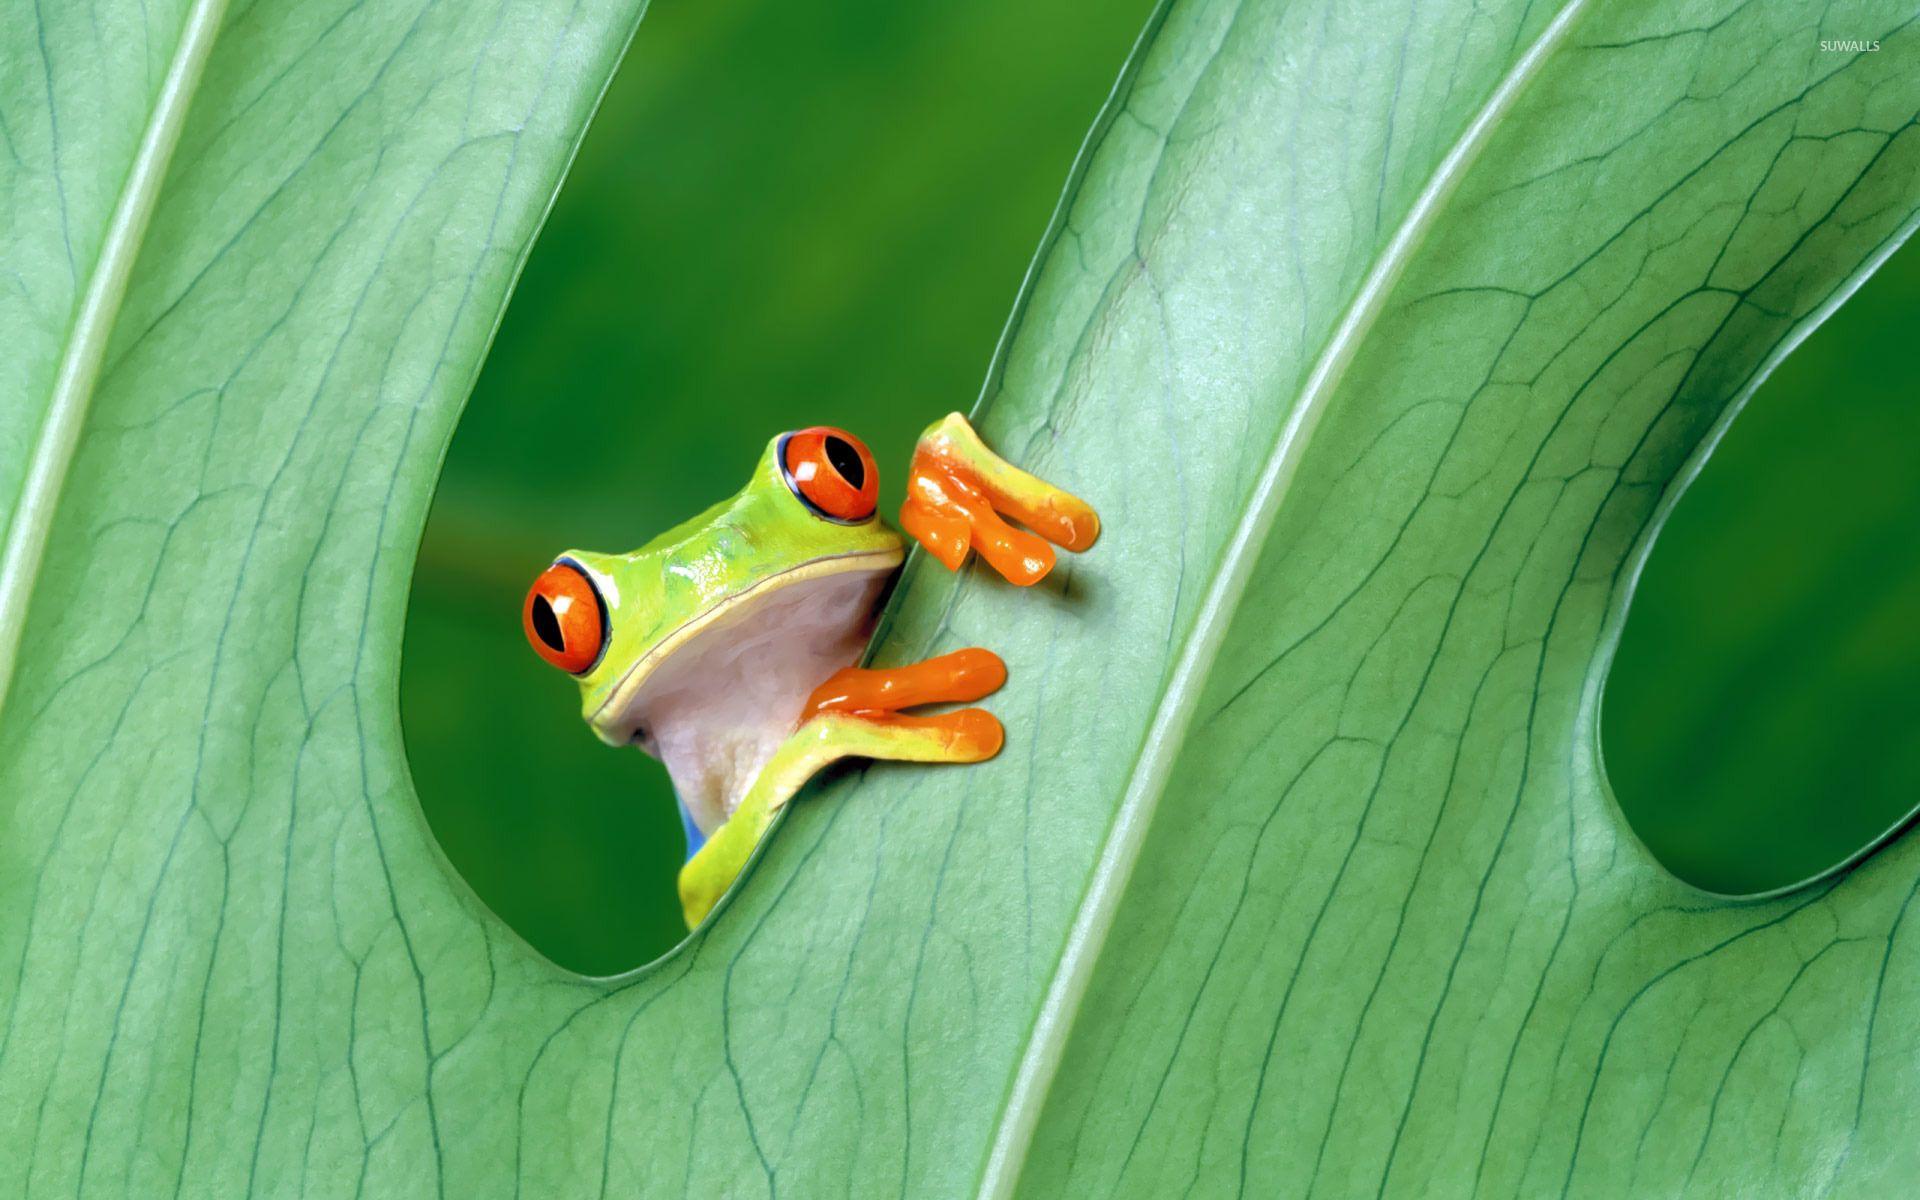 Red Eyed Tree Frog Wallpaper Animal Wallpapers 19866 Frog Wallpaper Red Eyed Tree Frog Tree Frogs